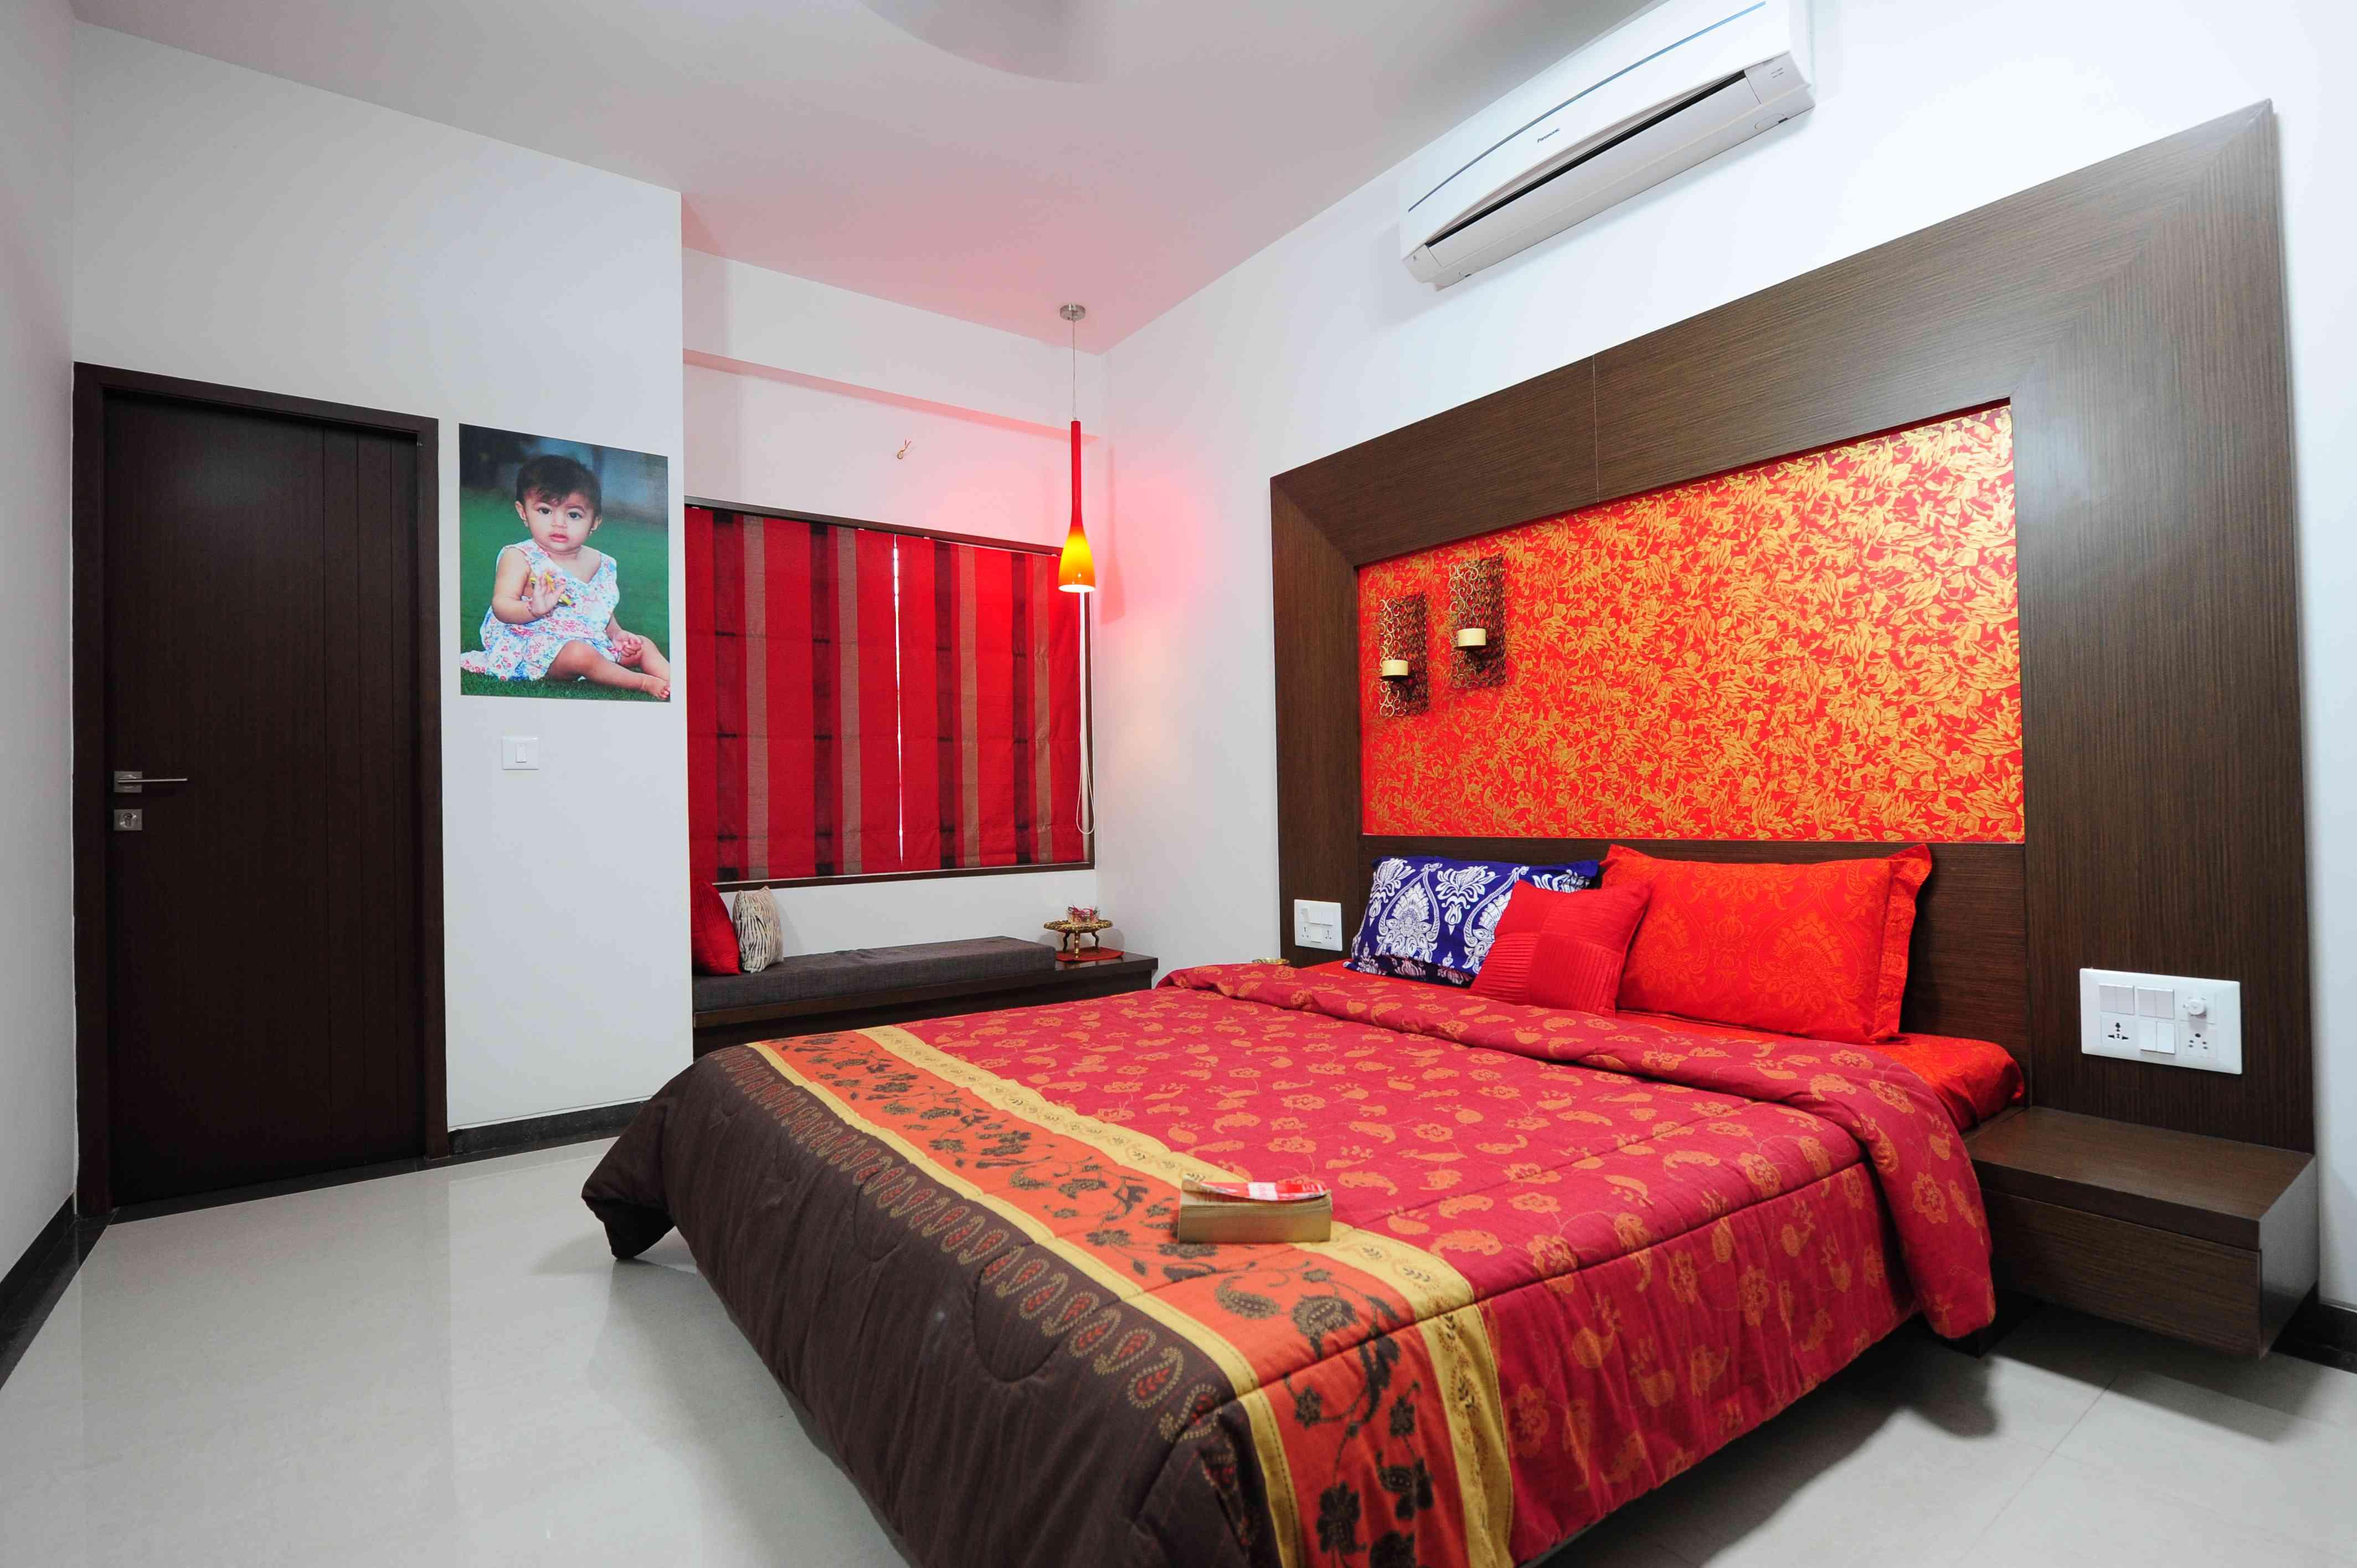 Kids Bedroom Designs India : ... Designs on Pinterest  Kid Bedrooms, Kids Bedroom Designs and India